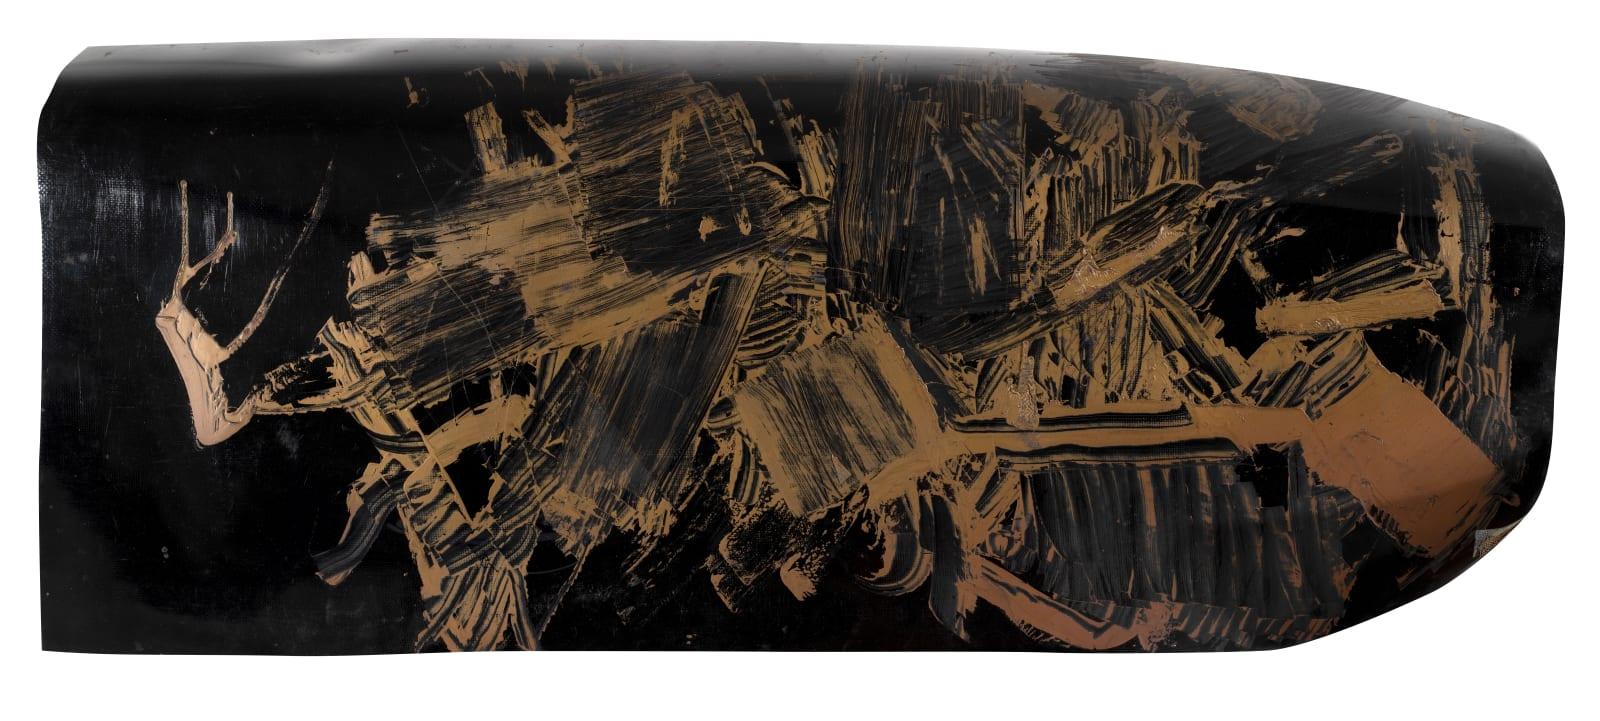 Painting on plastic, c.1958-60 Oil on plastic 60 x 135cm The Gustav Metzger Foundation